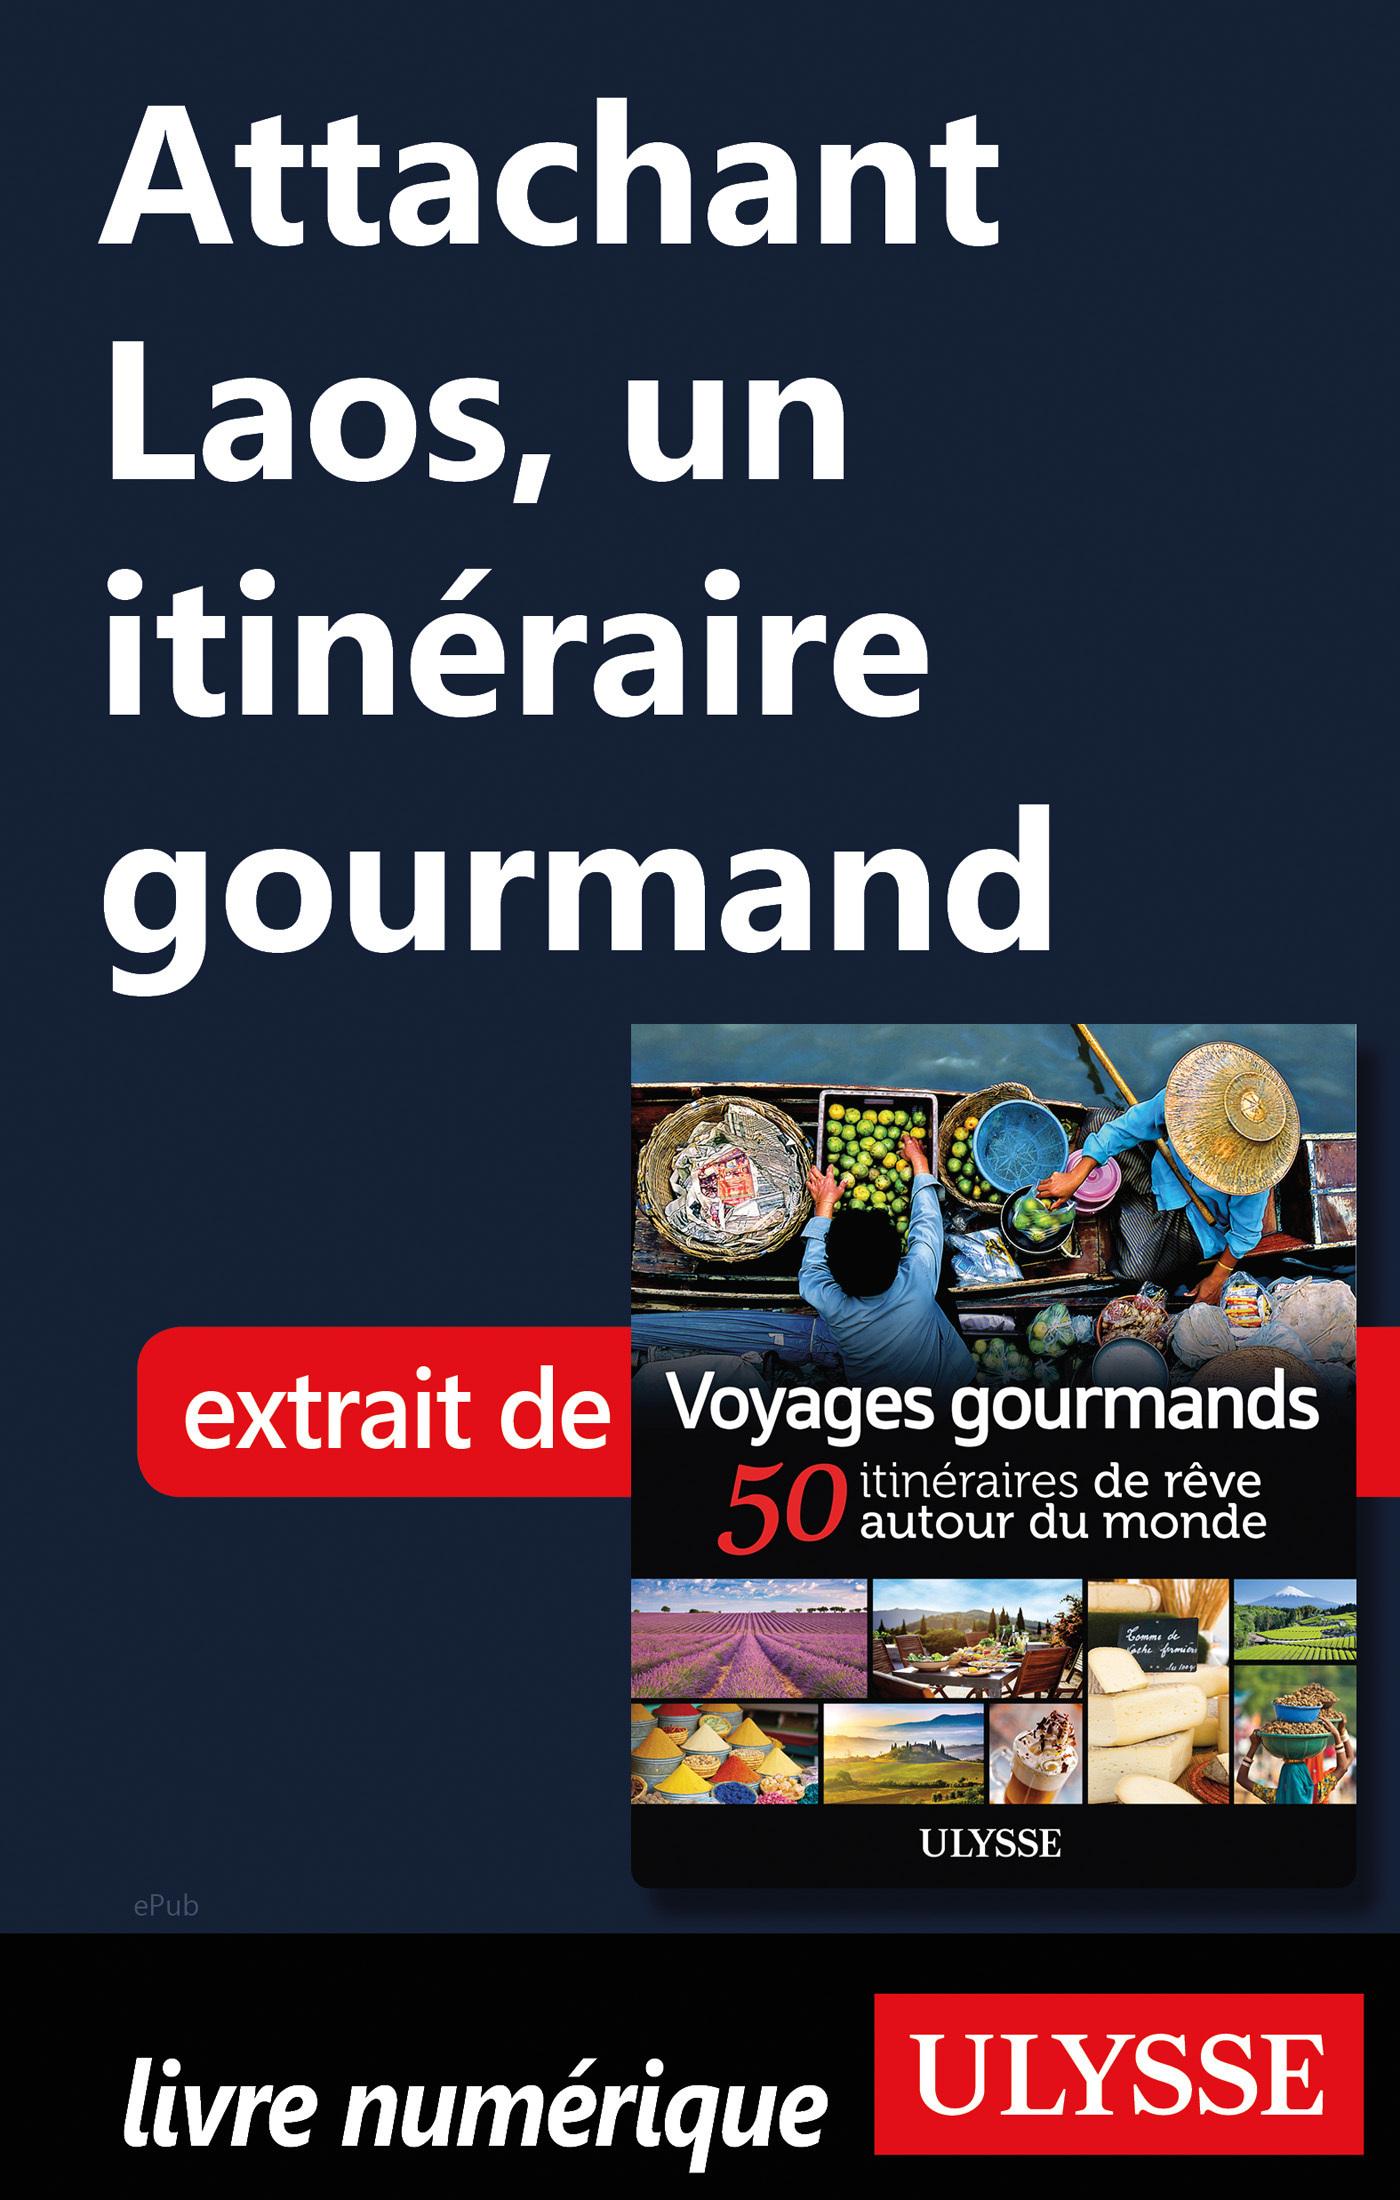 Attachant Laos - Un itinéraire gourmand